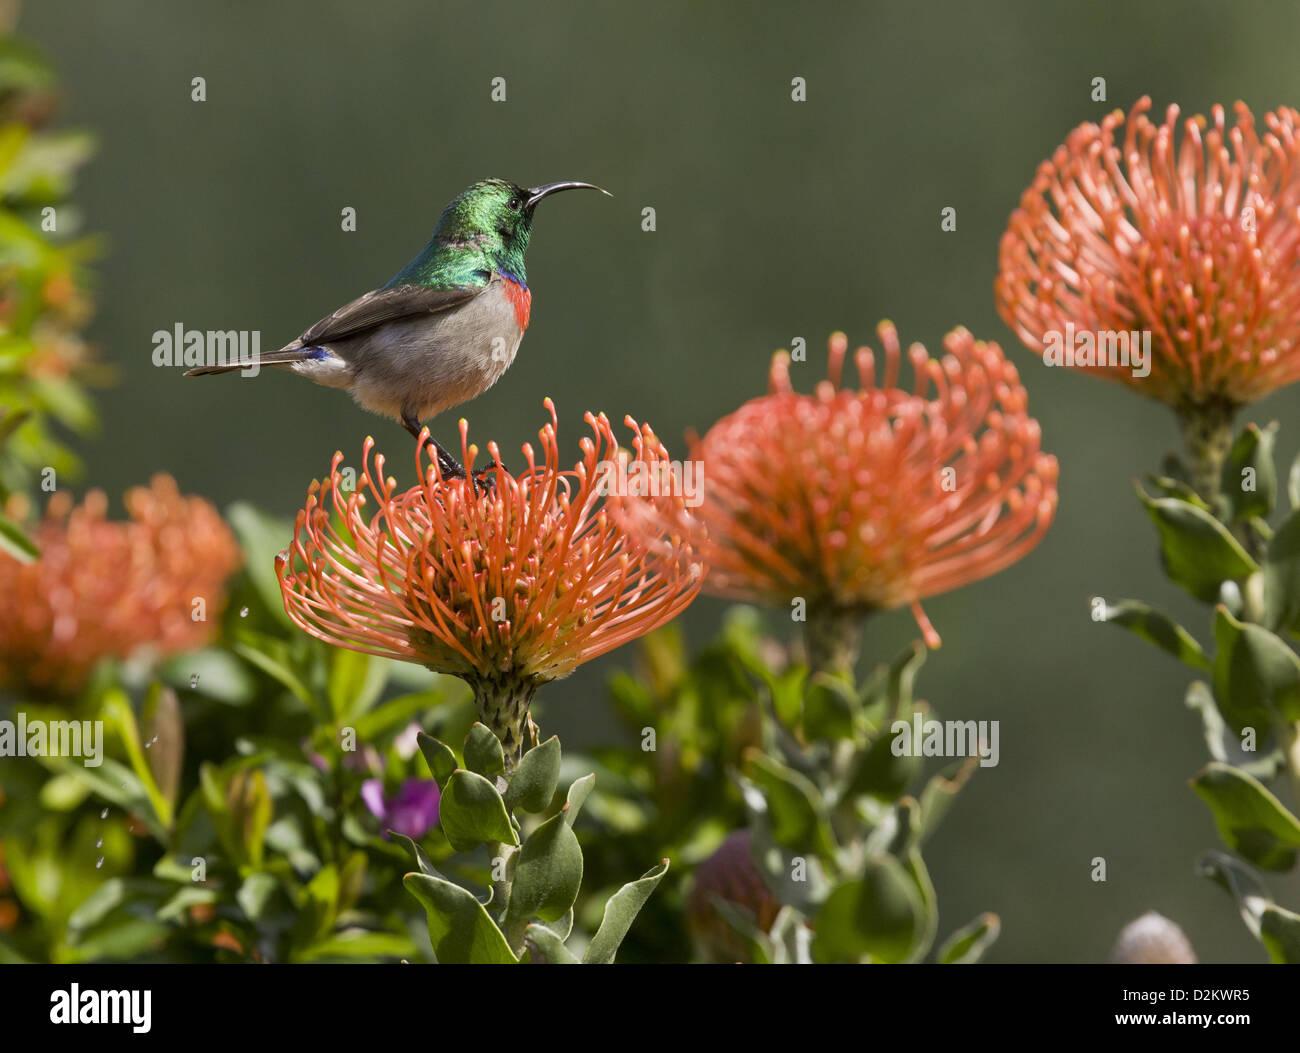 Male Southern Double-collared Sunbird (Cinnyris chalybeus) on Proteas (Leucospermum cordifolium), South Africa - Stock Image